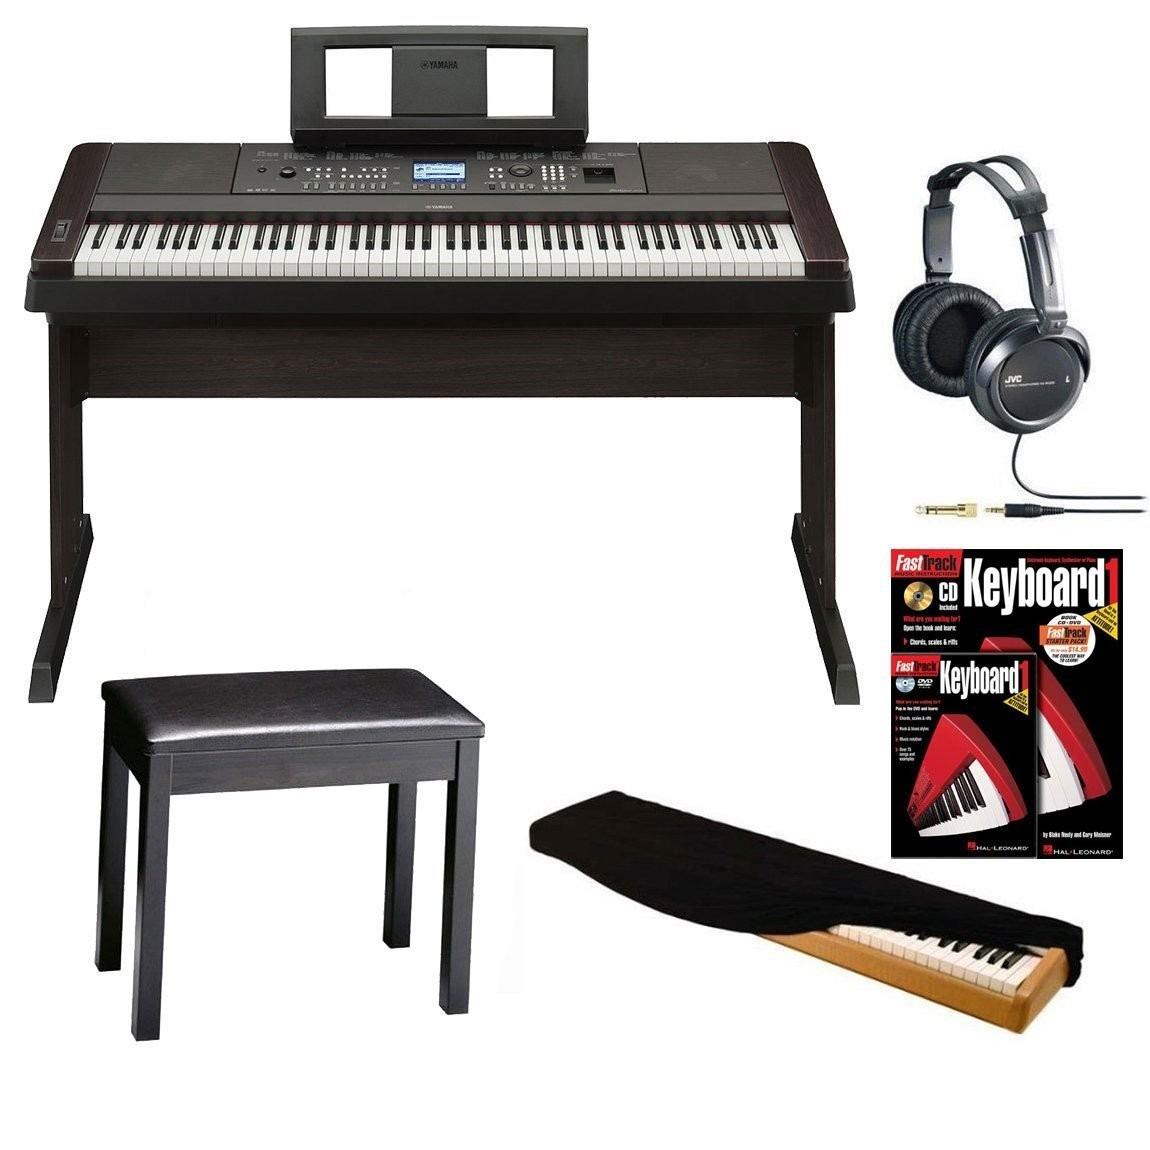 Pin teclado yamaha dgx o clasf on pinterest for Yamaha dgx 630 ypg 635